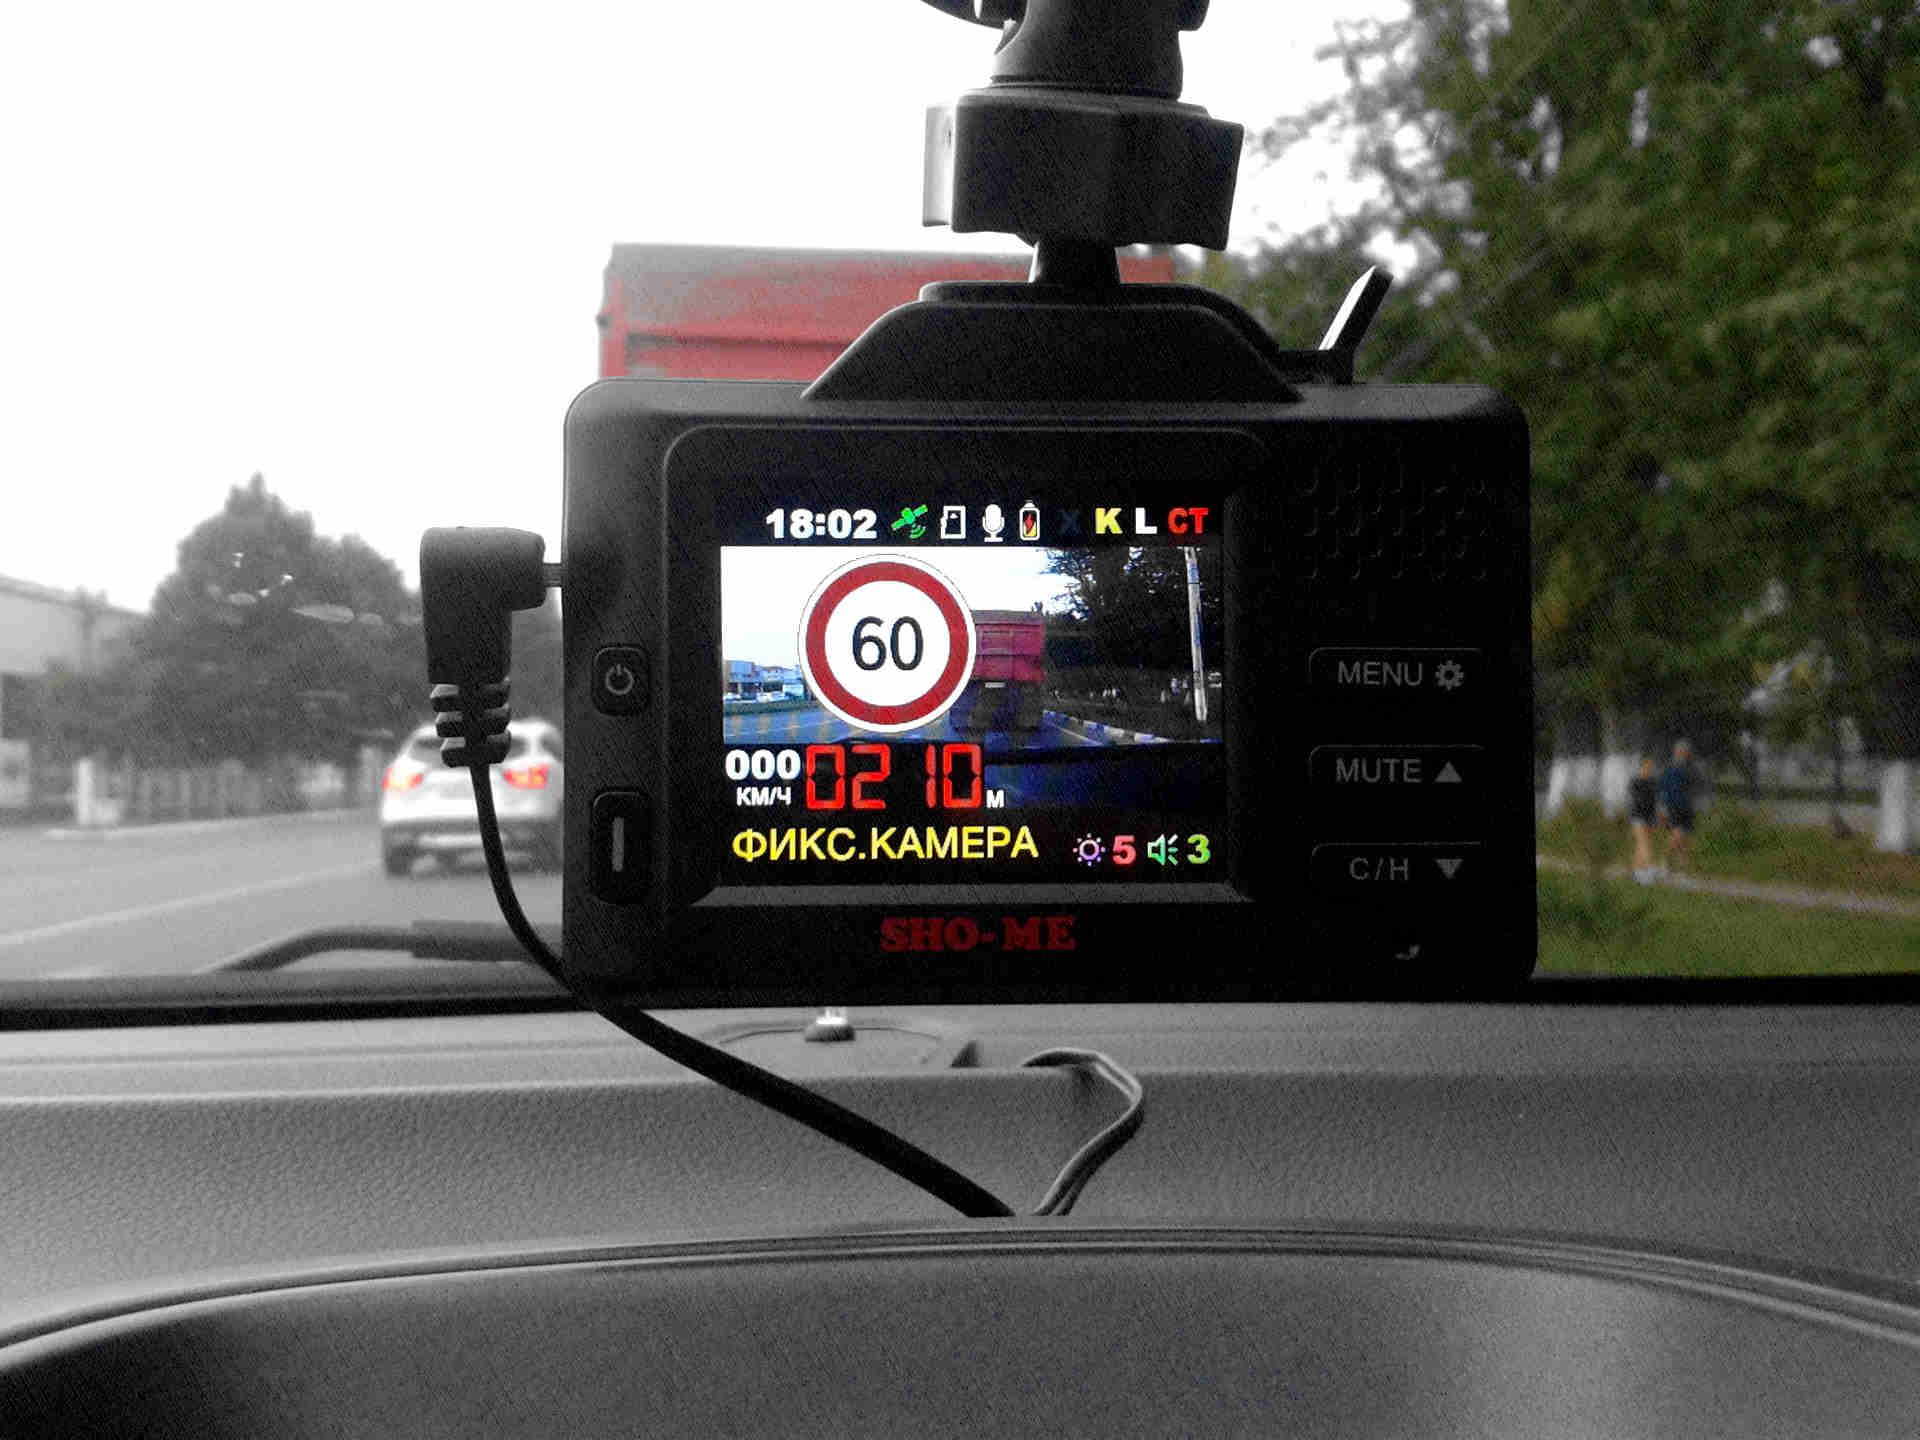 SHO-ME Combo Drive Signature GPS/GLONASS ТОП 2019